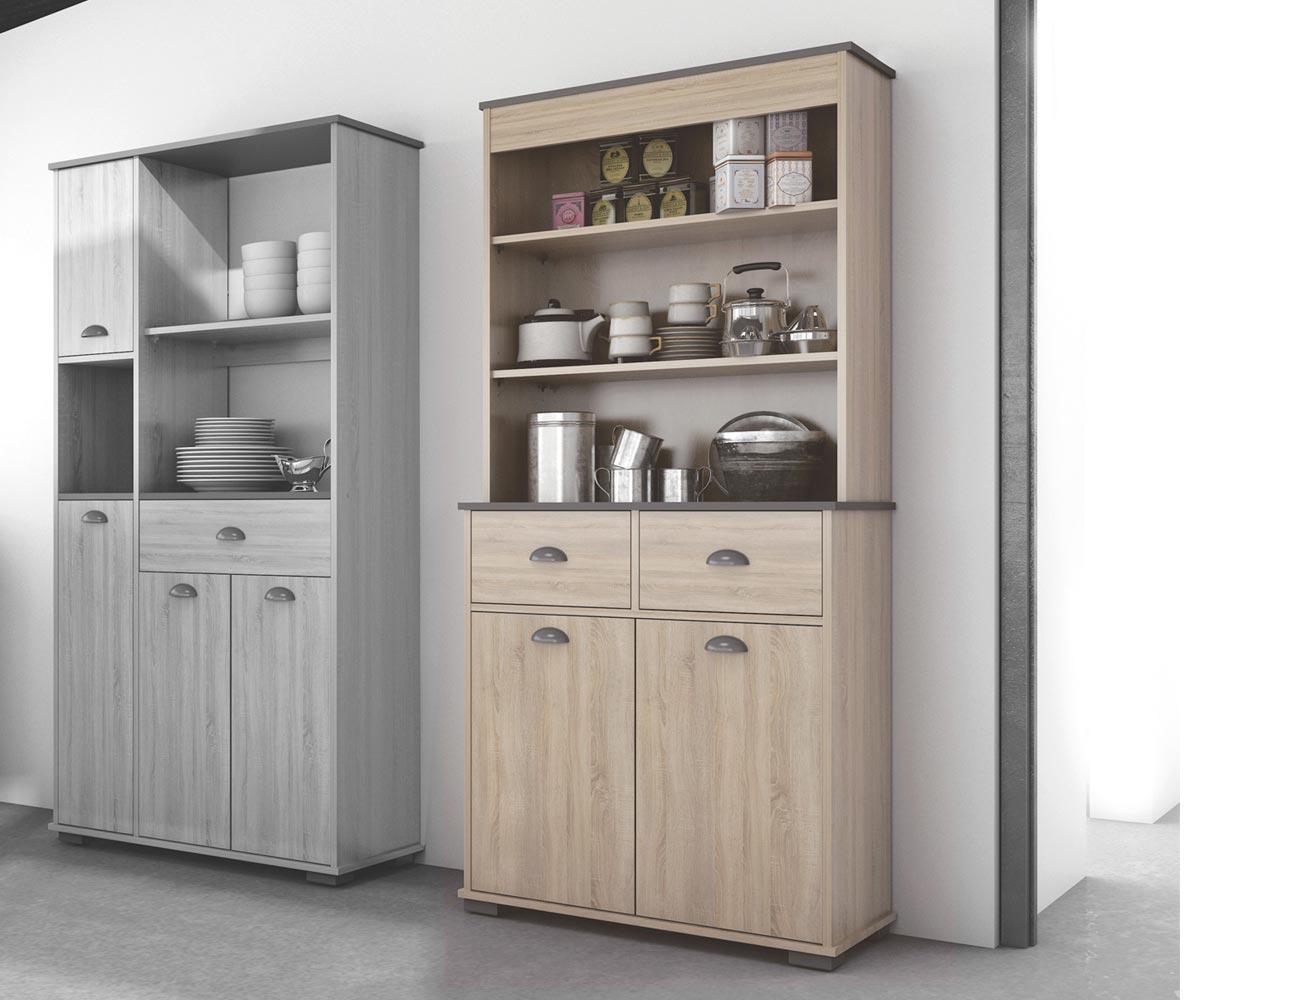 Muebles Buffet Para Cocina - Arquitectura Del Hogar - Serart.net